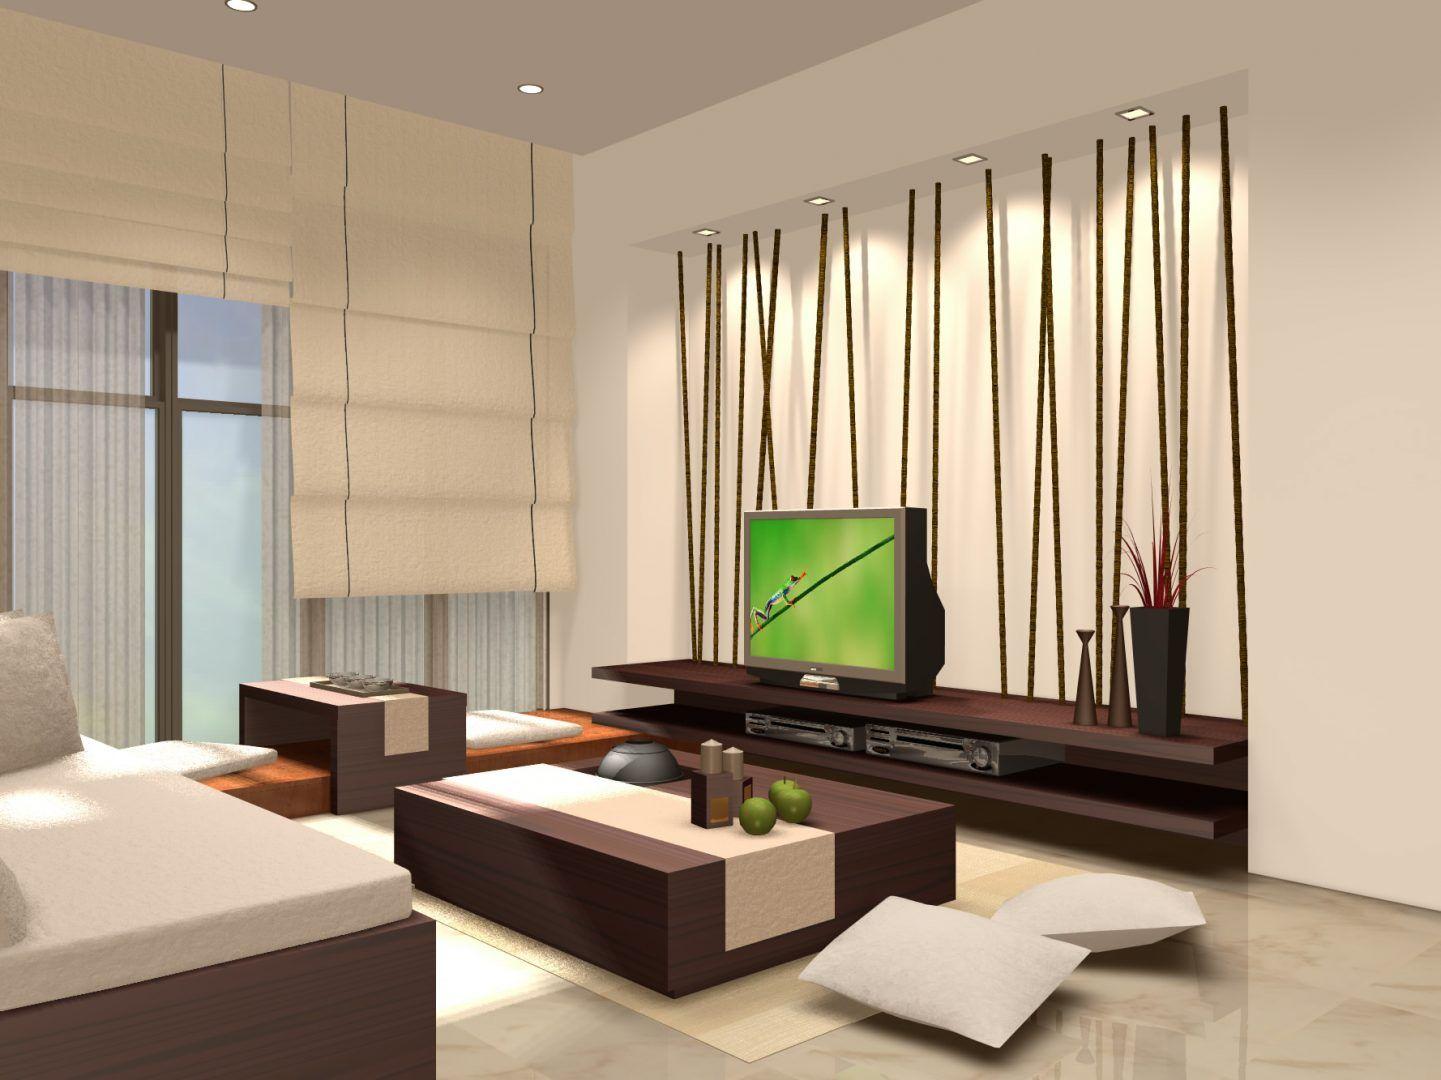 Salón comedor Zen  Decoracion de interiores, Diseño de interiores